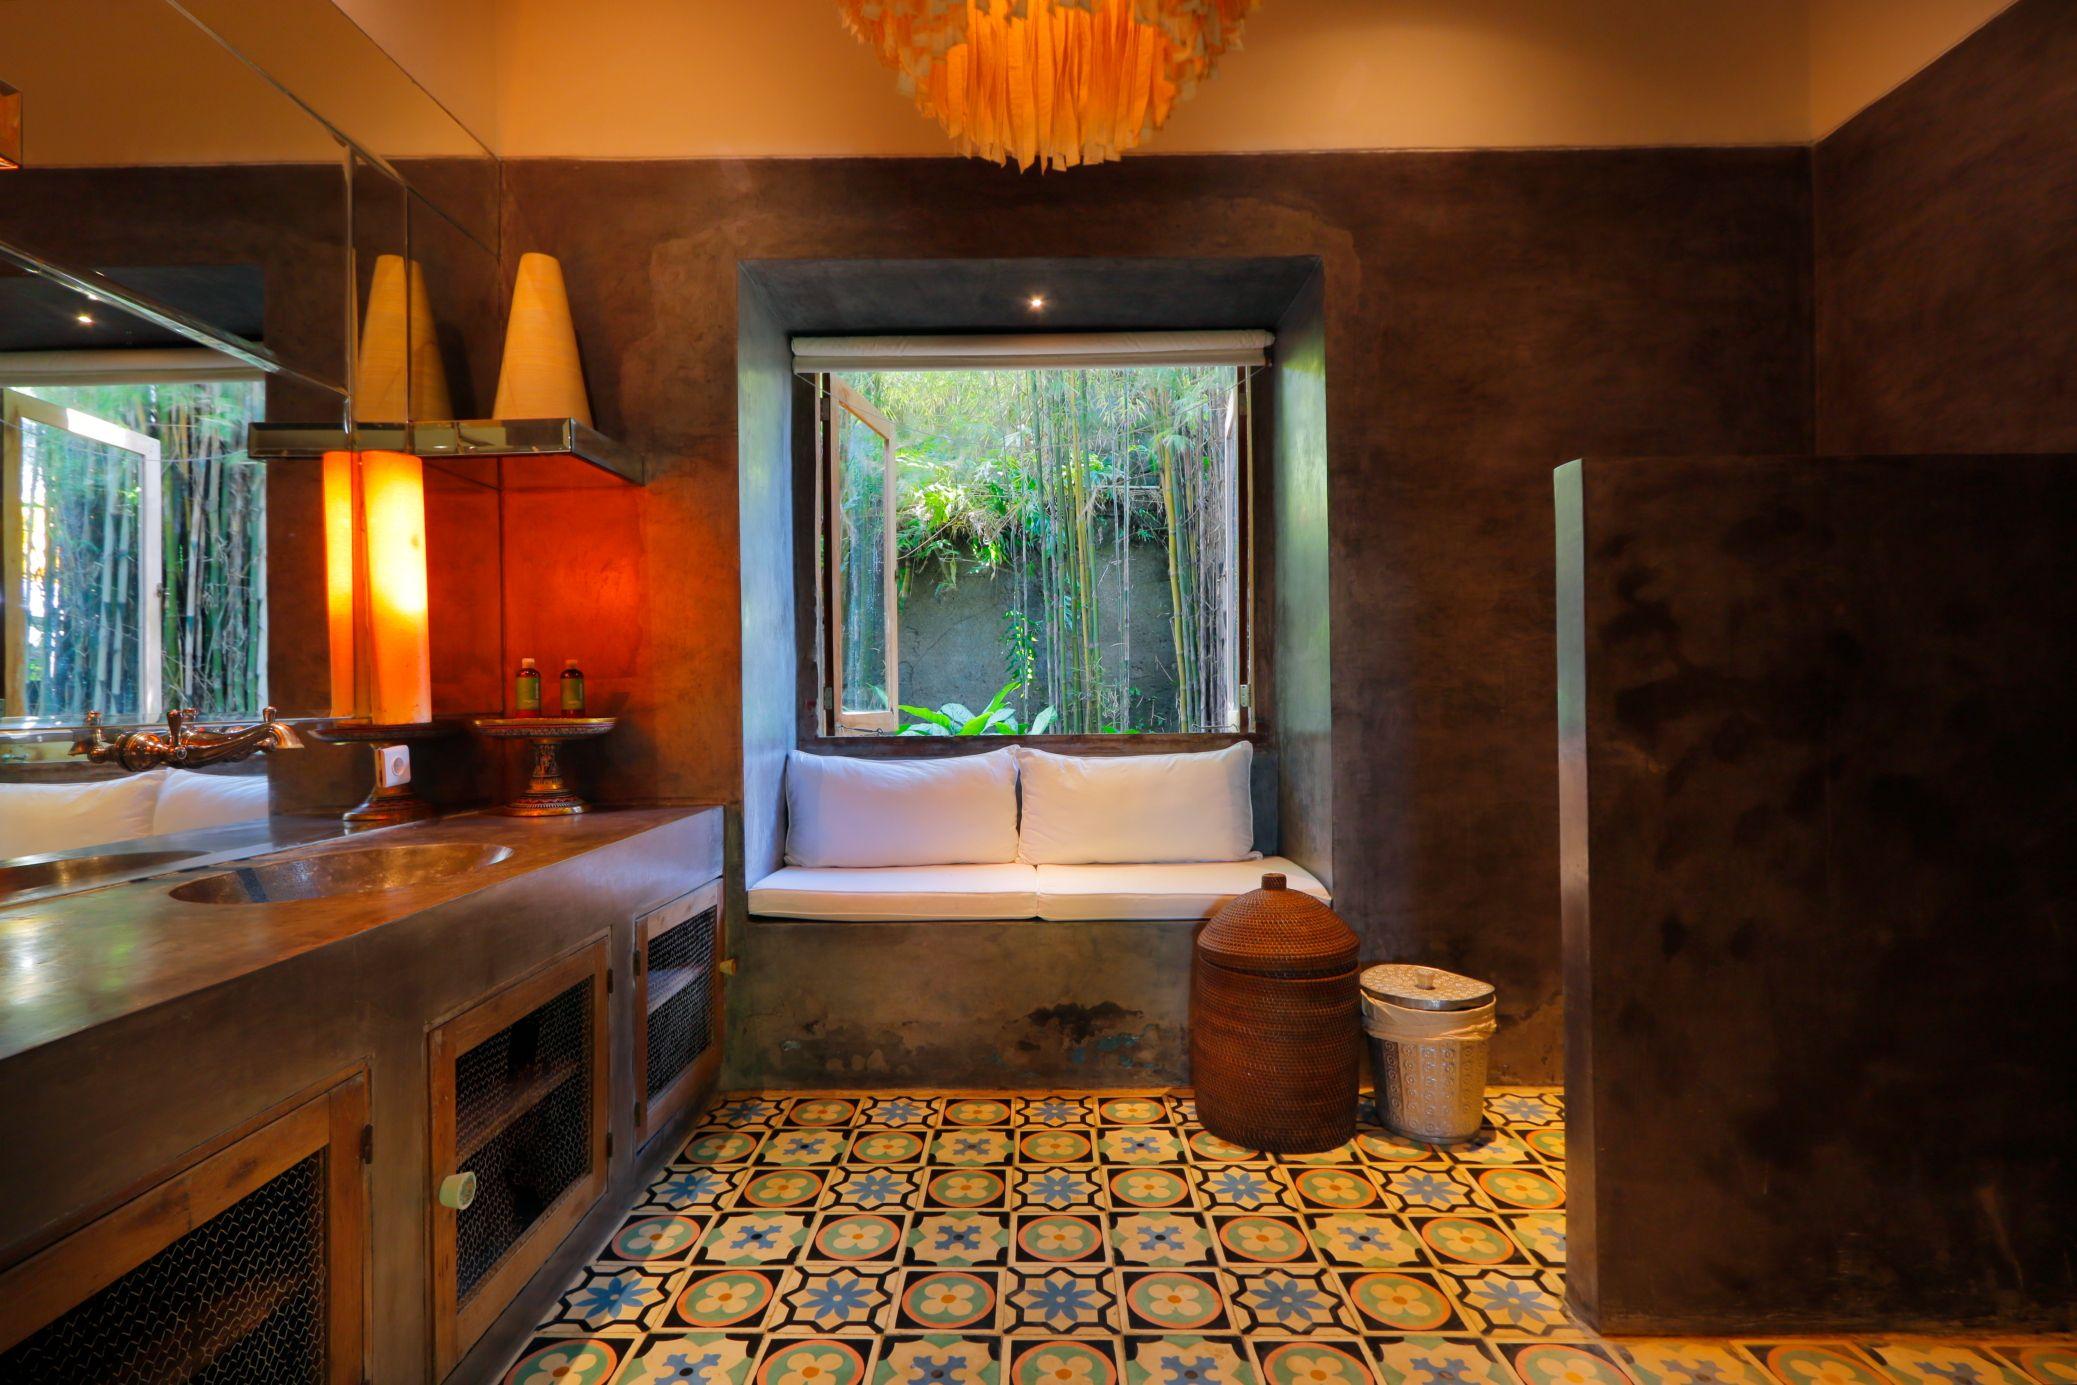 Lalaland Villa, Canggu, Bali Guest Room Bathroom Sitting Space Interior